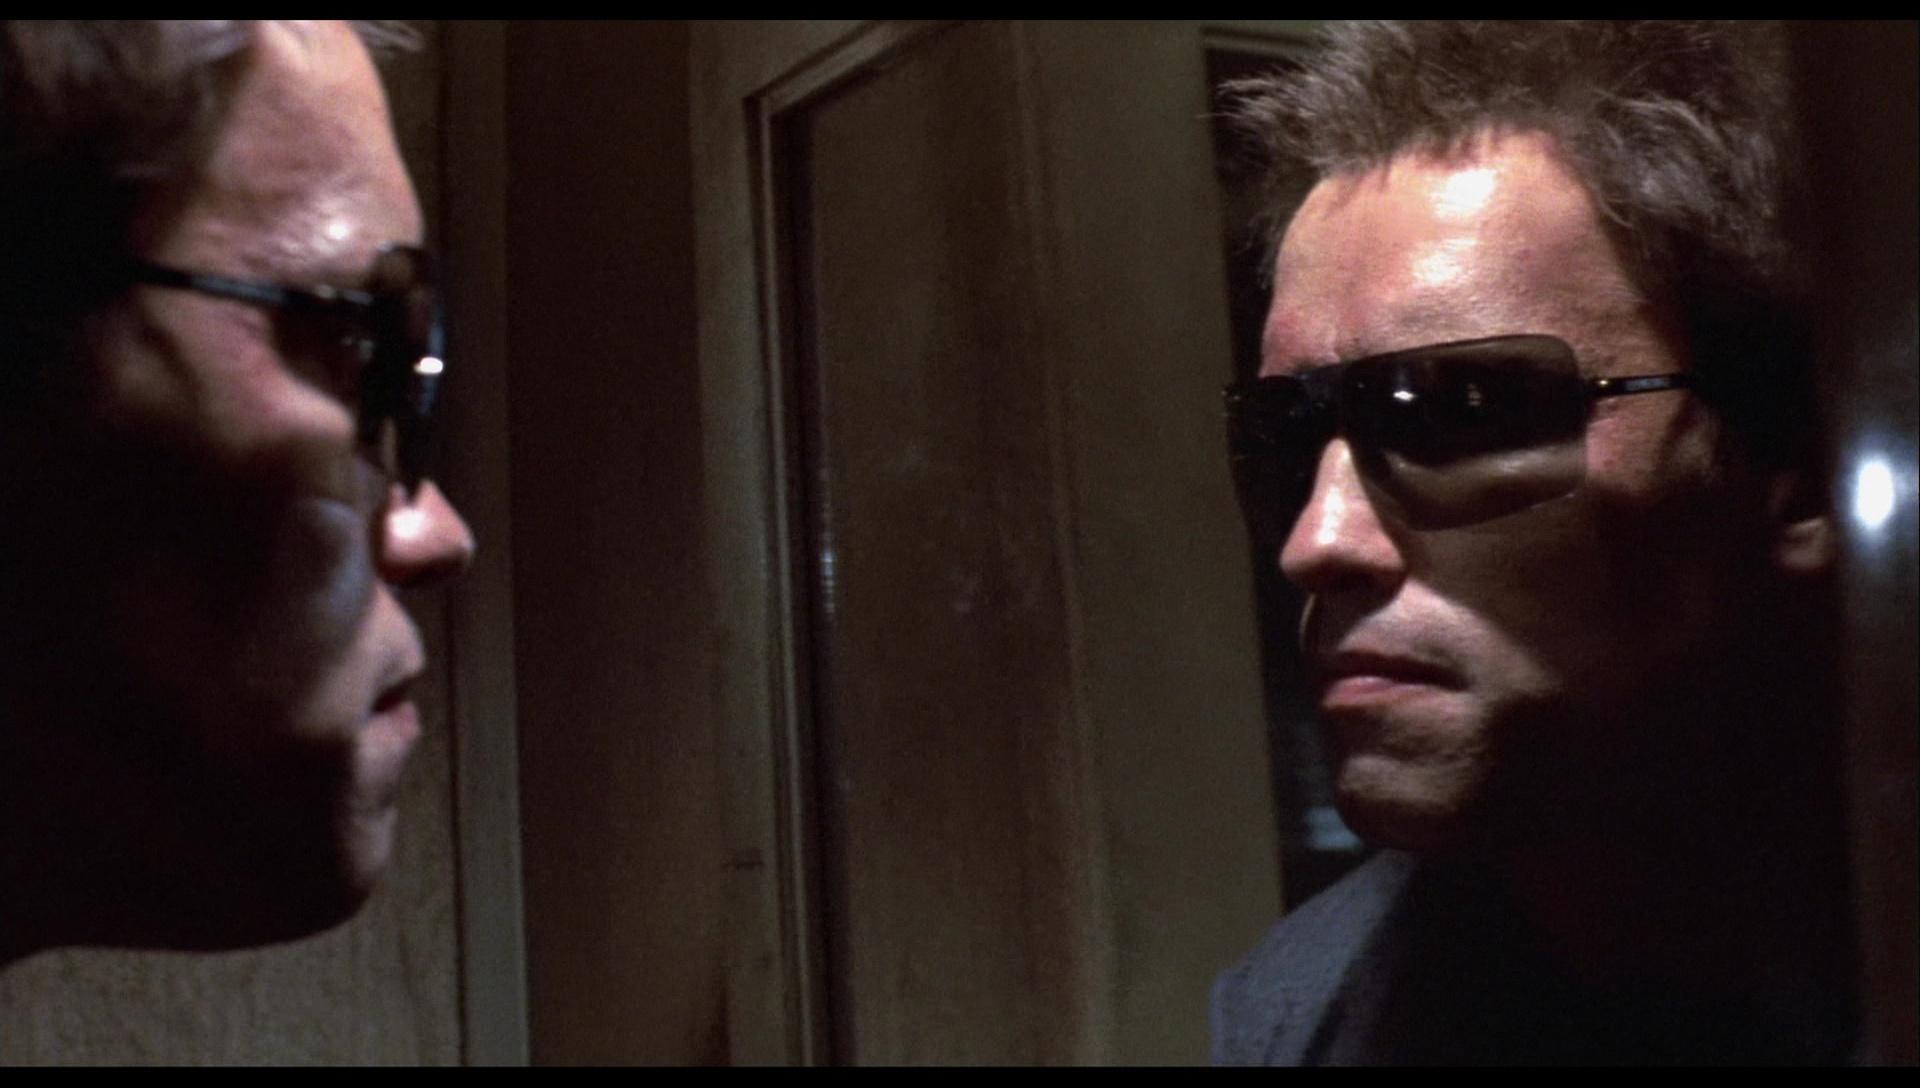 7c50bfcbd6 Gargoyles Sunglasses Worn by Arnold Schwarzenegger in The Terminator (1984)  Movie Product Placement